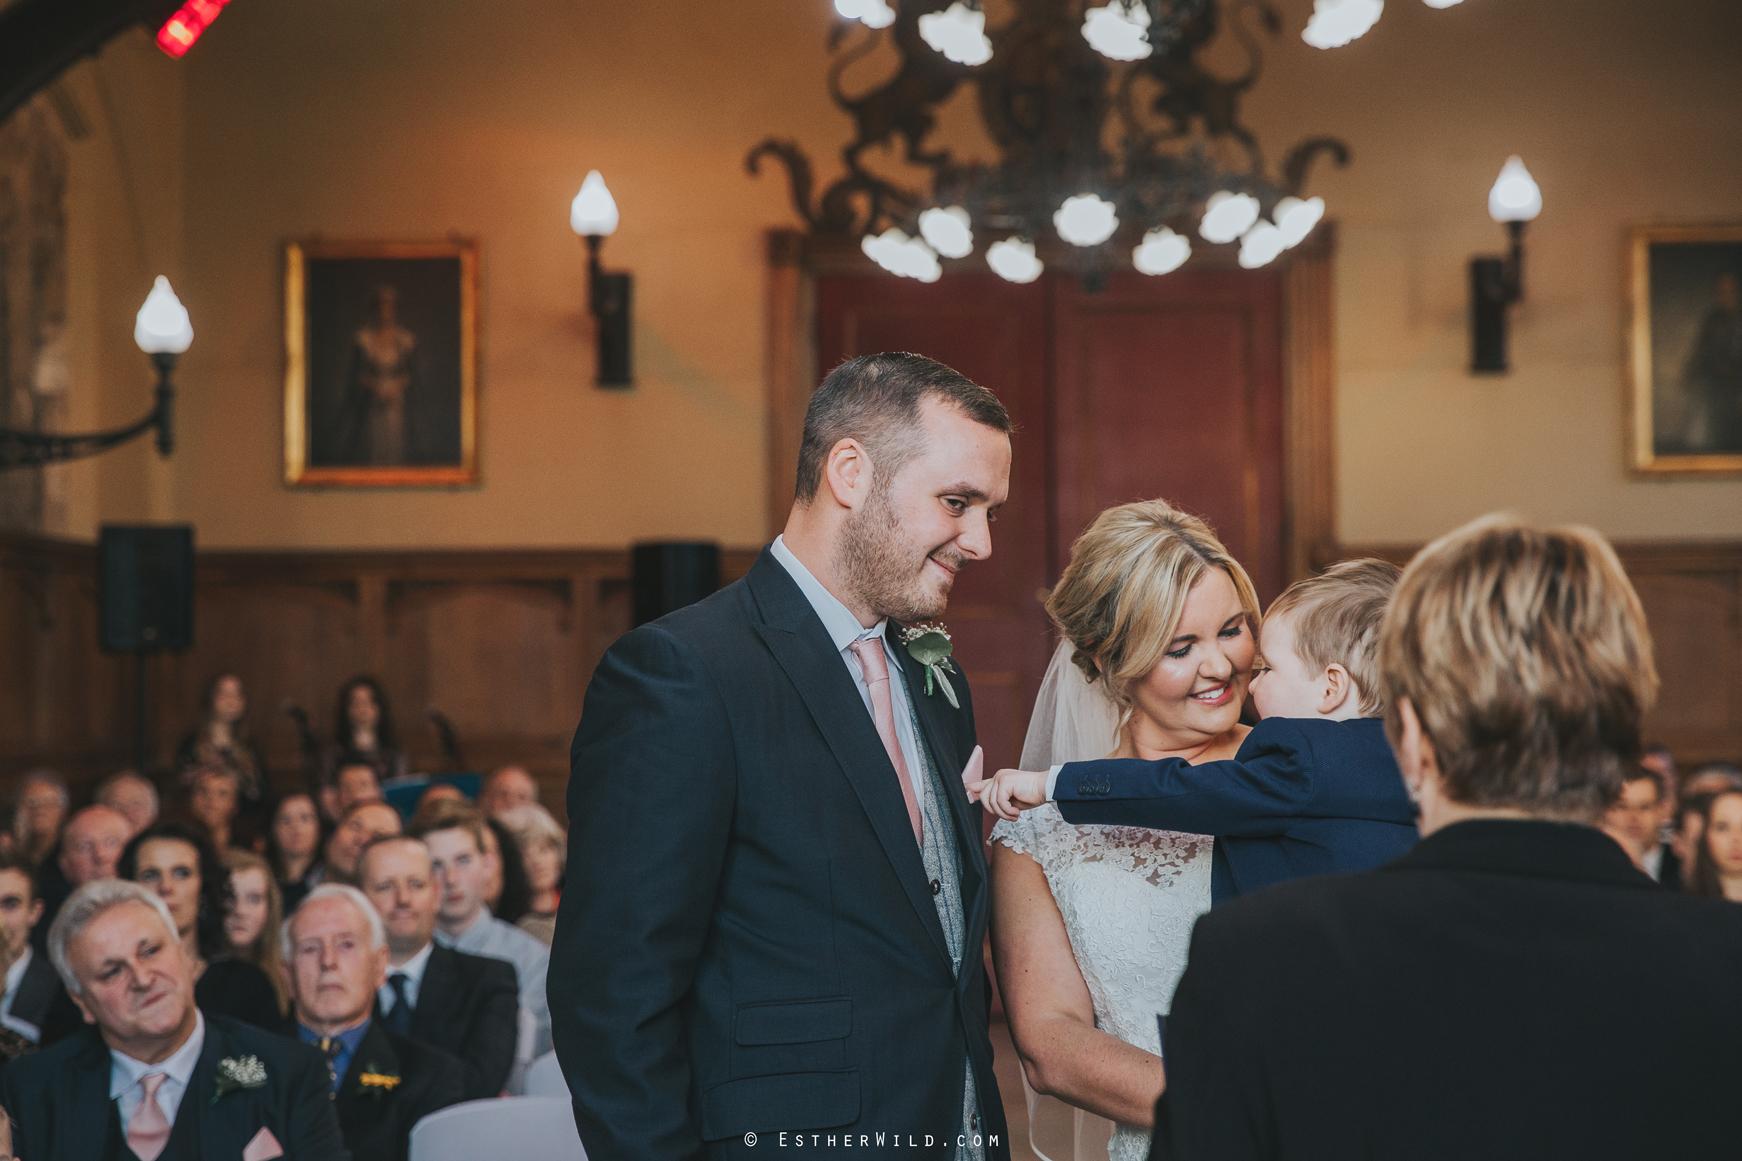 Wedding_Kings_Lynn_Town_Hall_Norfolk_Photographer_Esther_Wild_IMG_0996.jpg